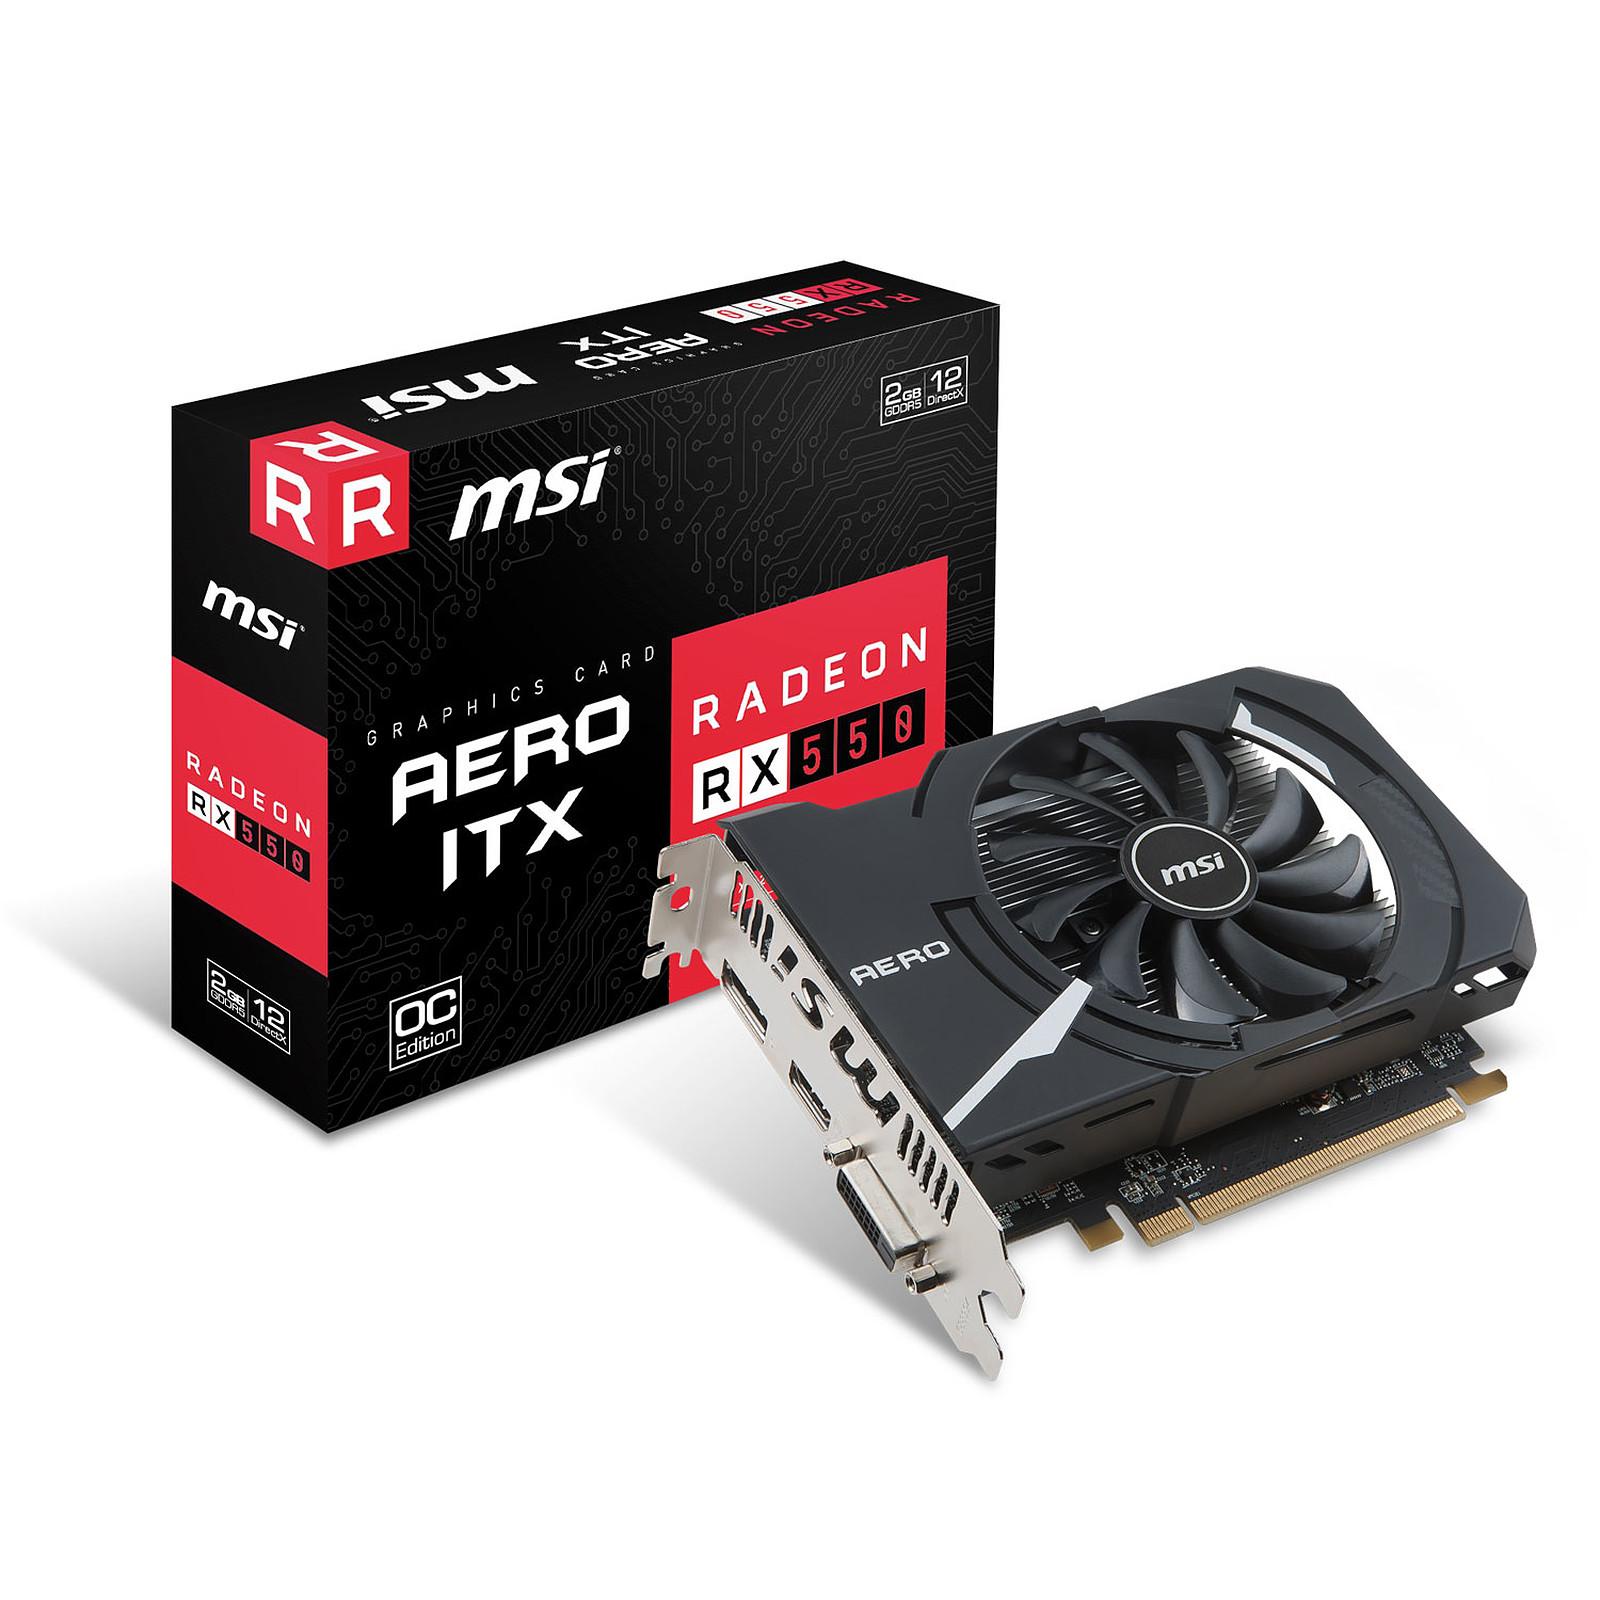 MSI Radeon RX 550 AERO ITX 2G OC